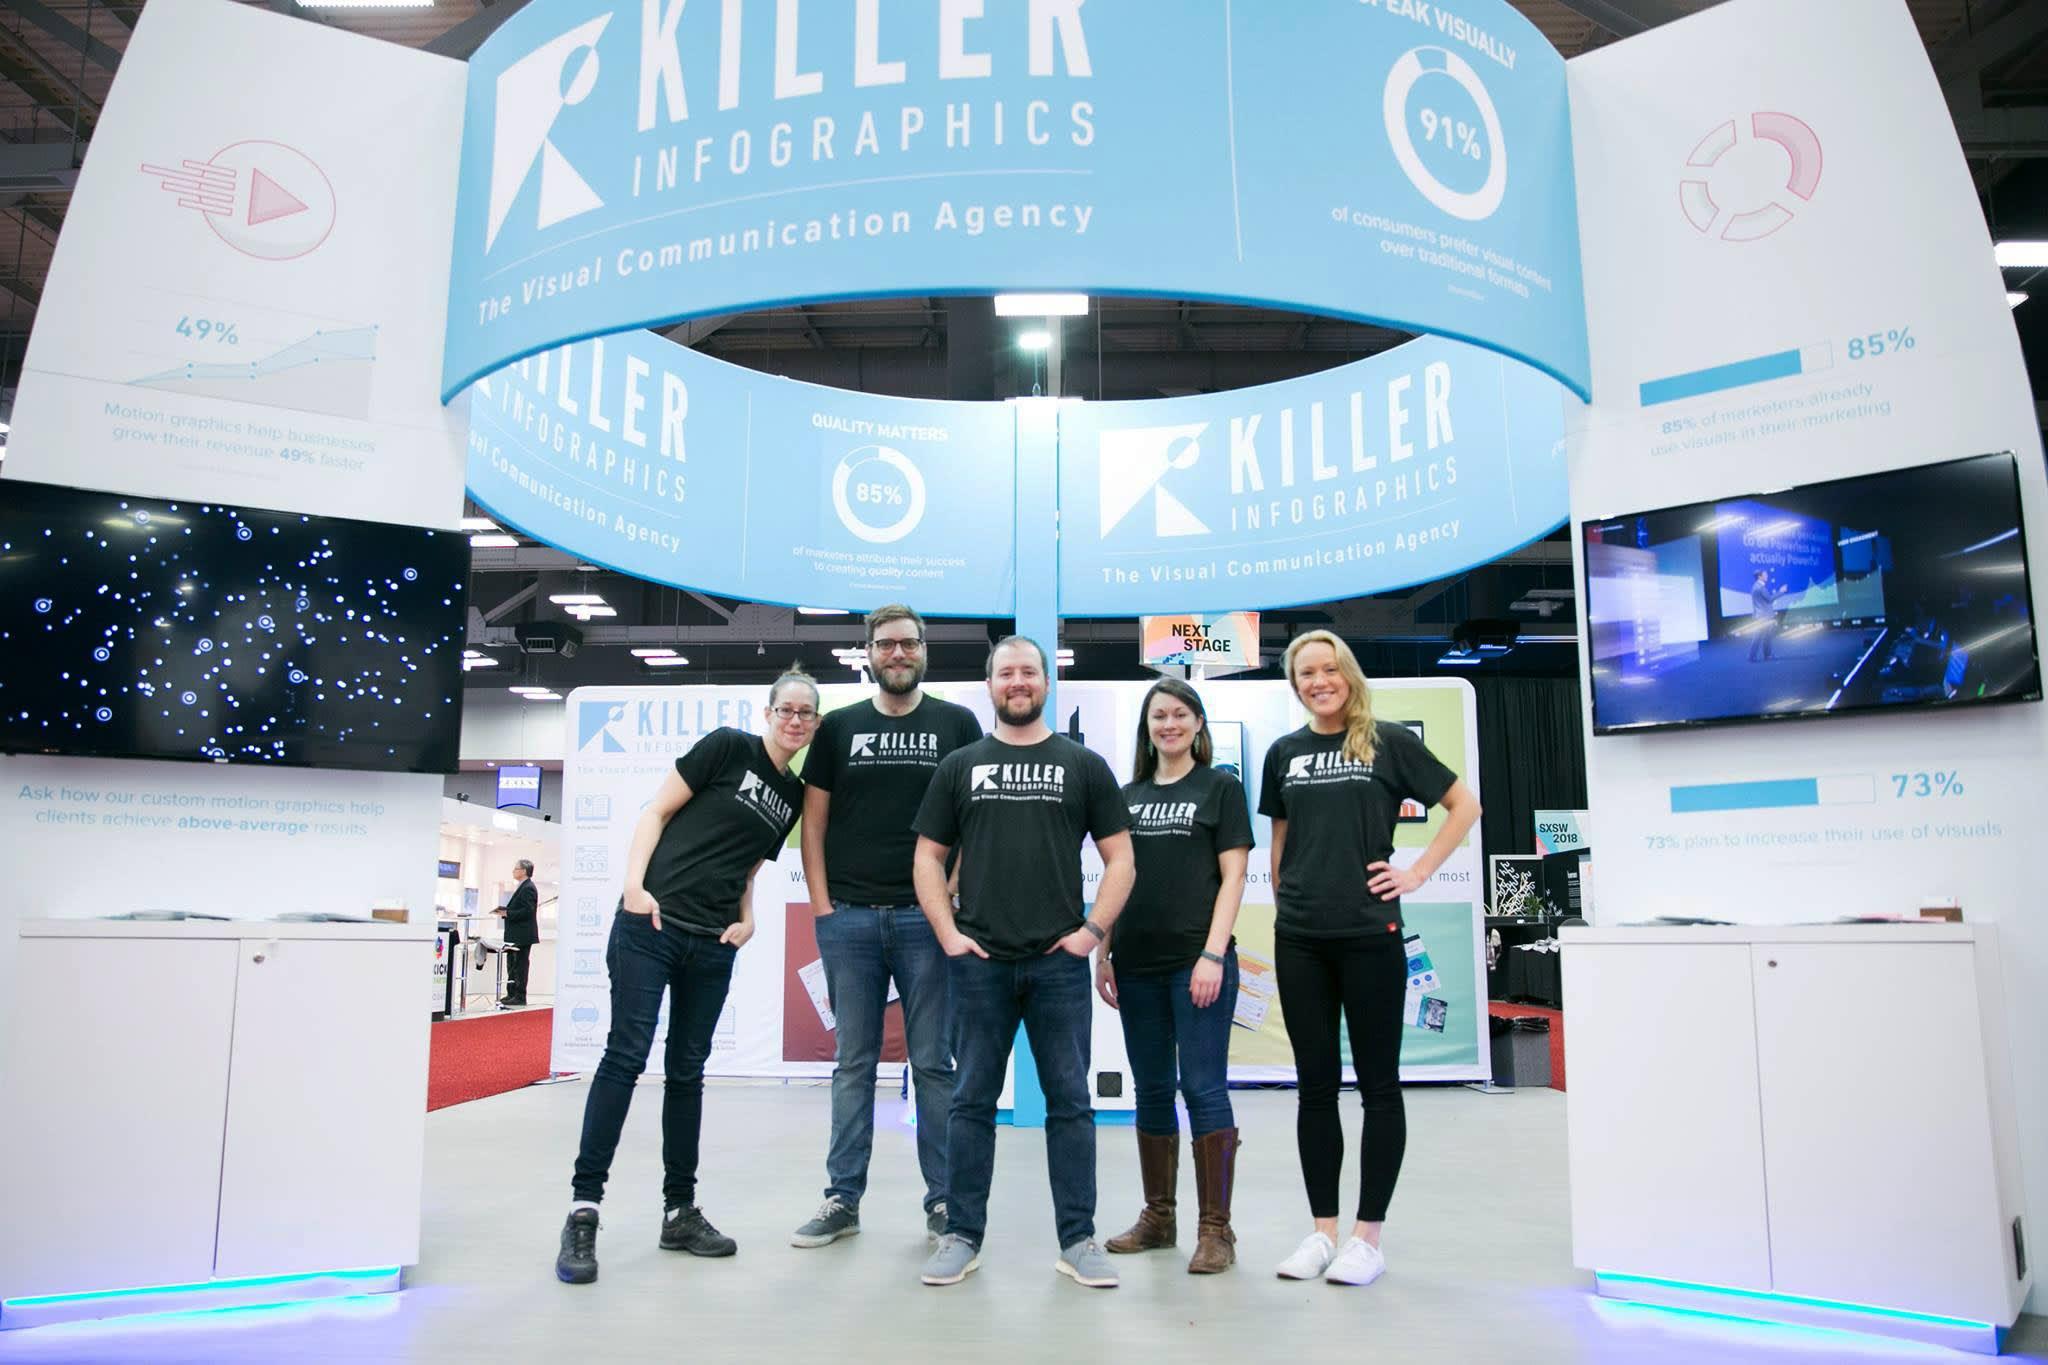 Killer Infographics SXSW 2018 Booth